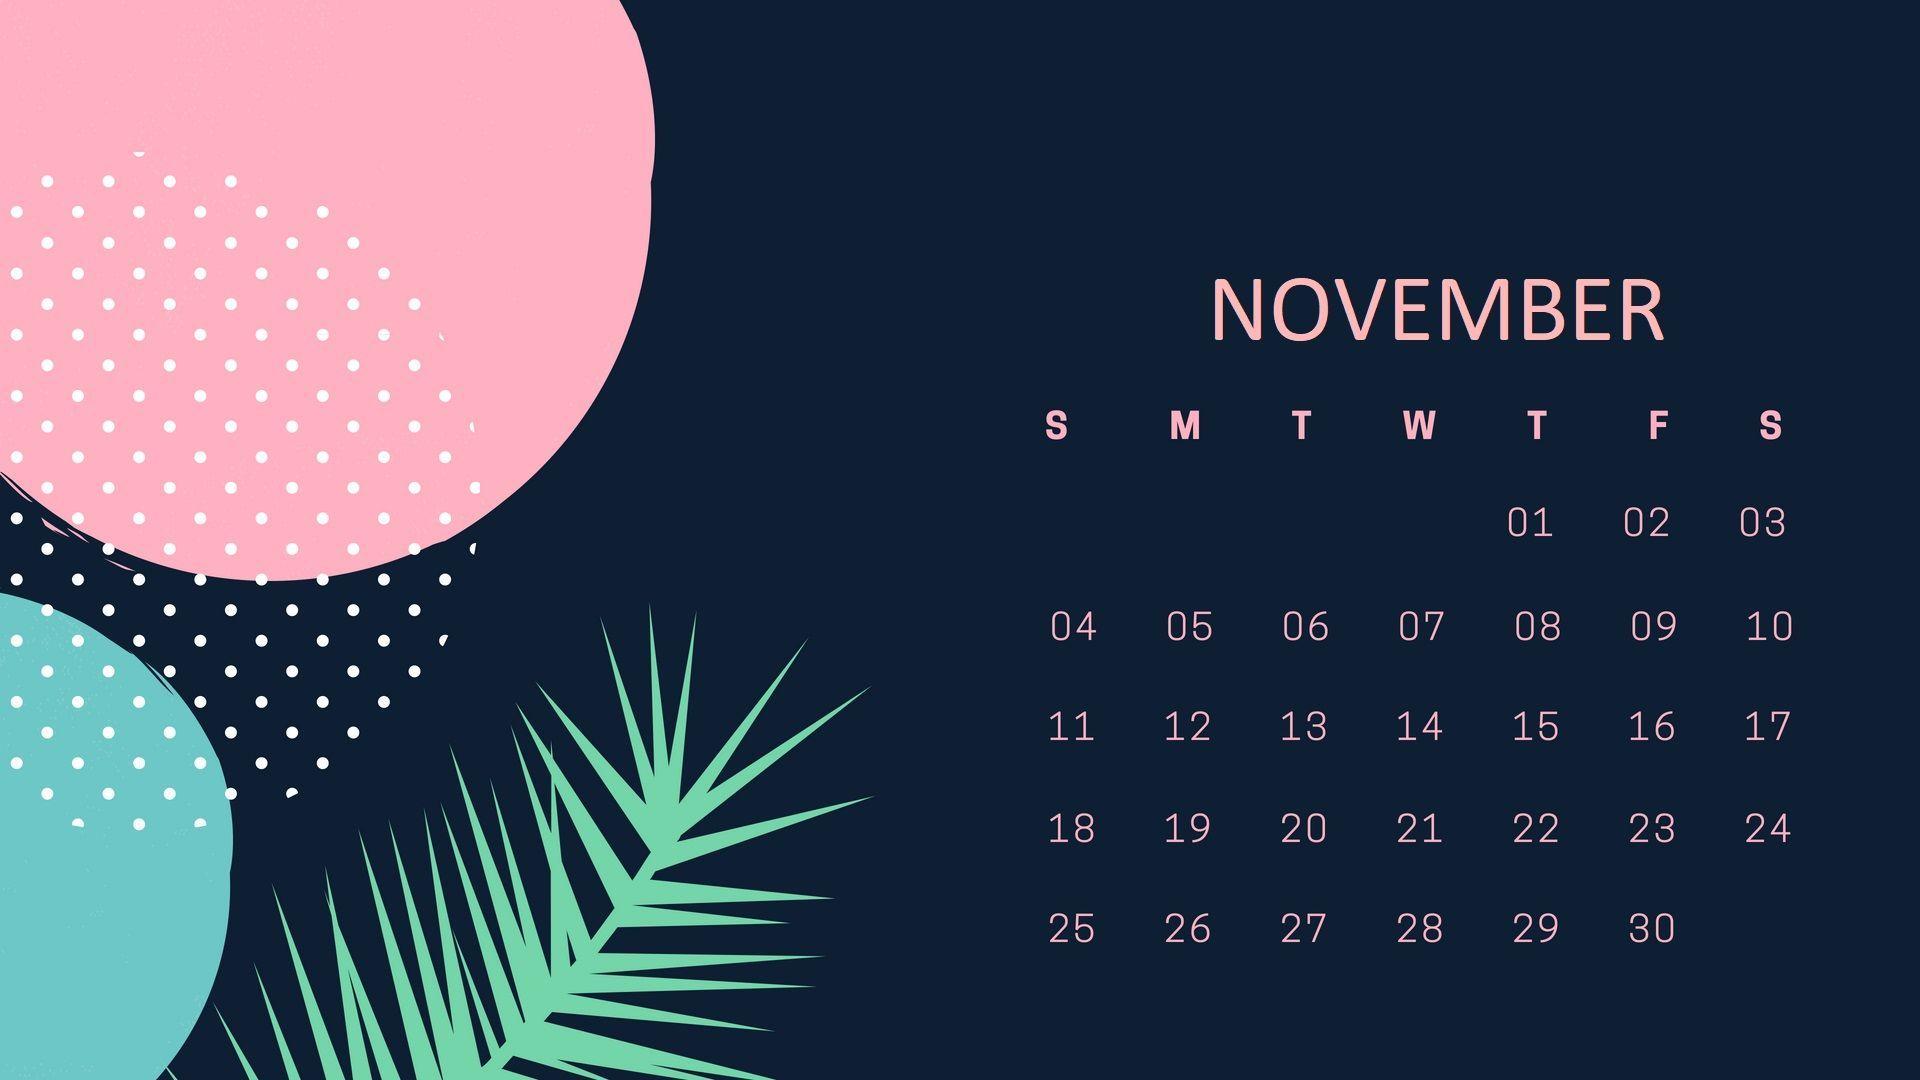 November 2018 Calendar Wallpaper Calendar Wallpaper November Wallpaper Desktop Calendar